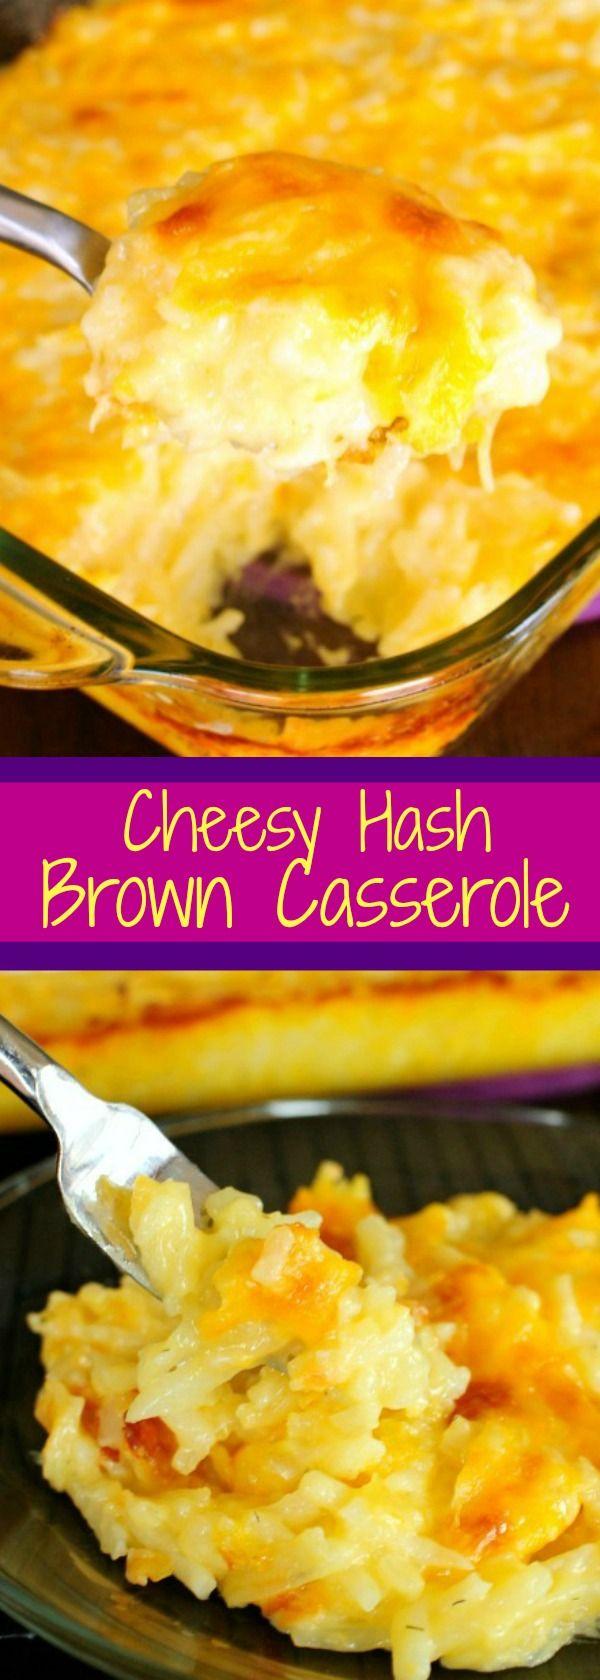 Cheesy Hash Brown Casserole                                                                                                                                                                                 More